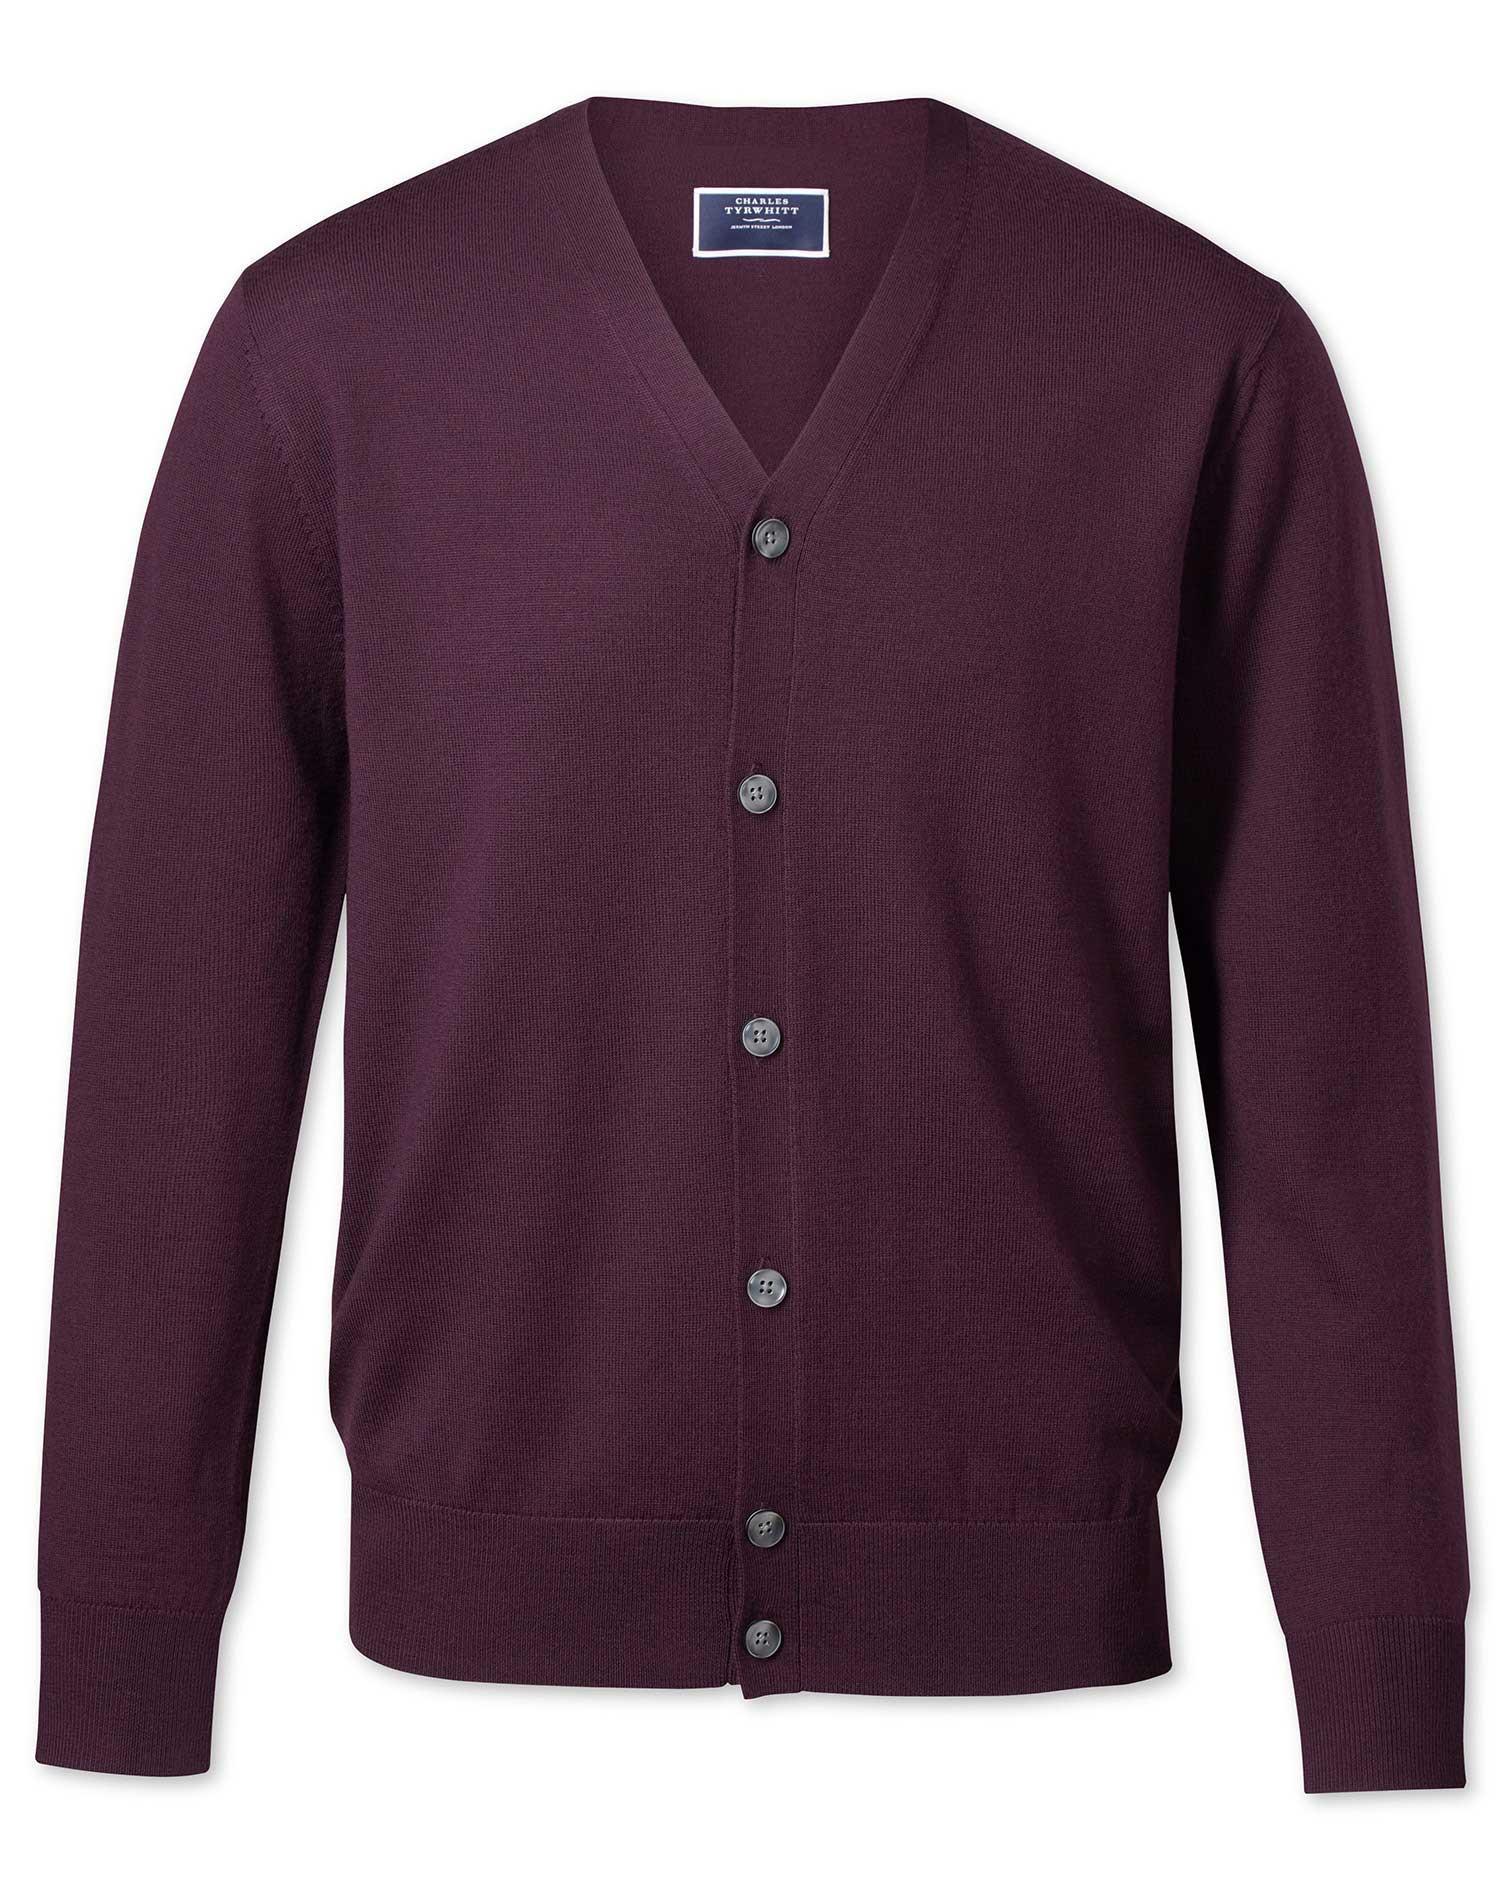 Wine Merino Wool Cardigan Size XL by Charles Tyrwhitt